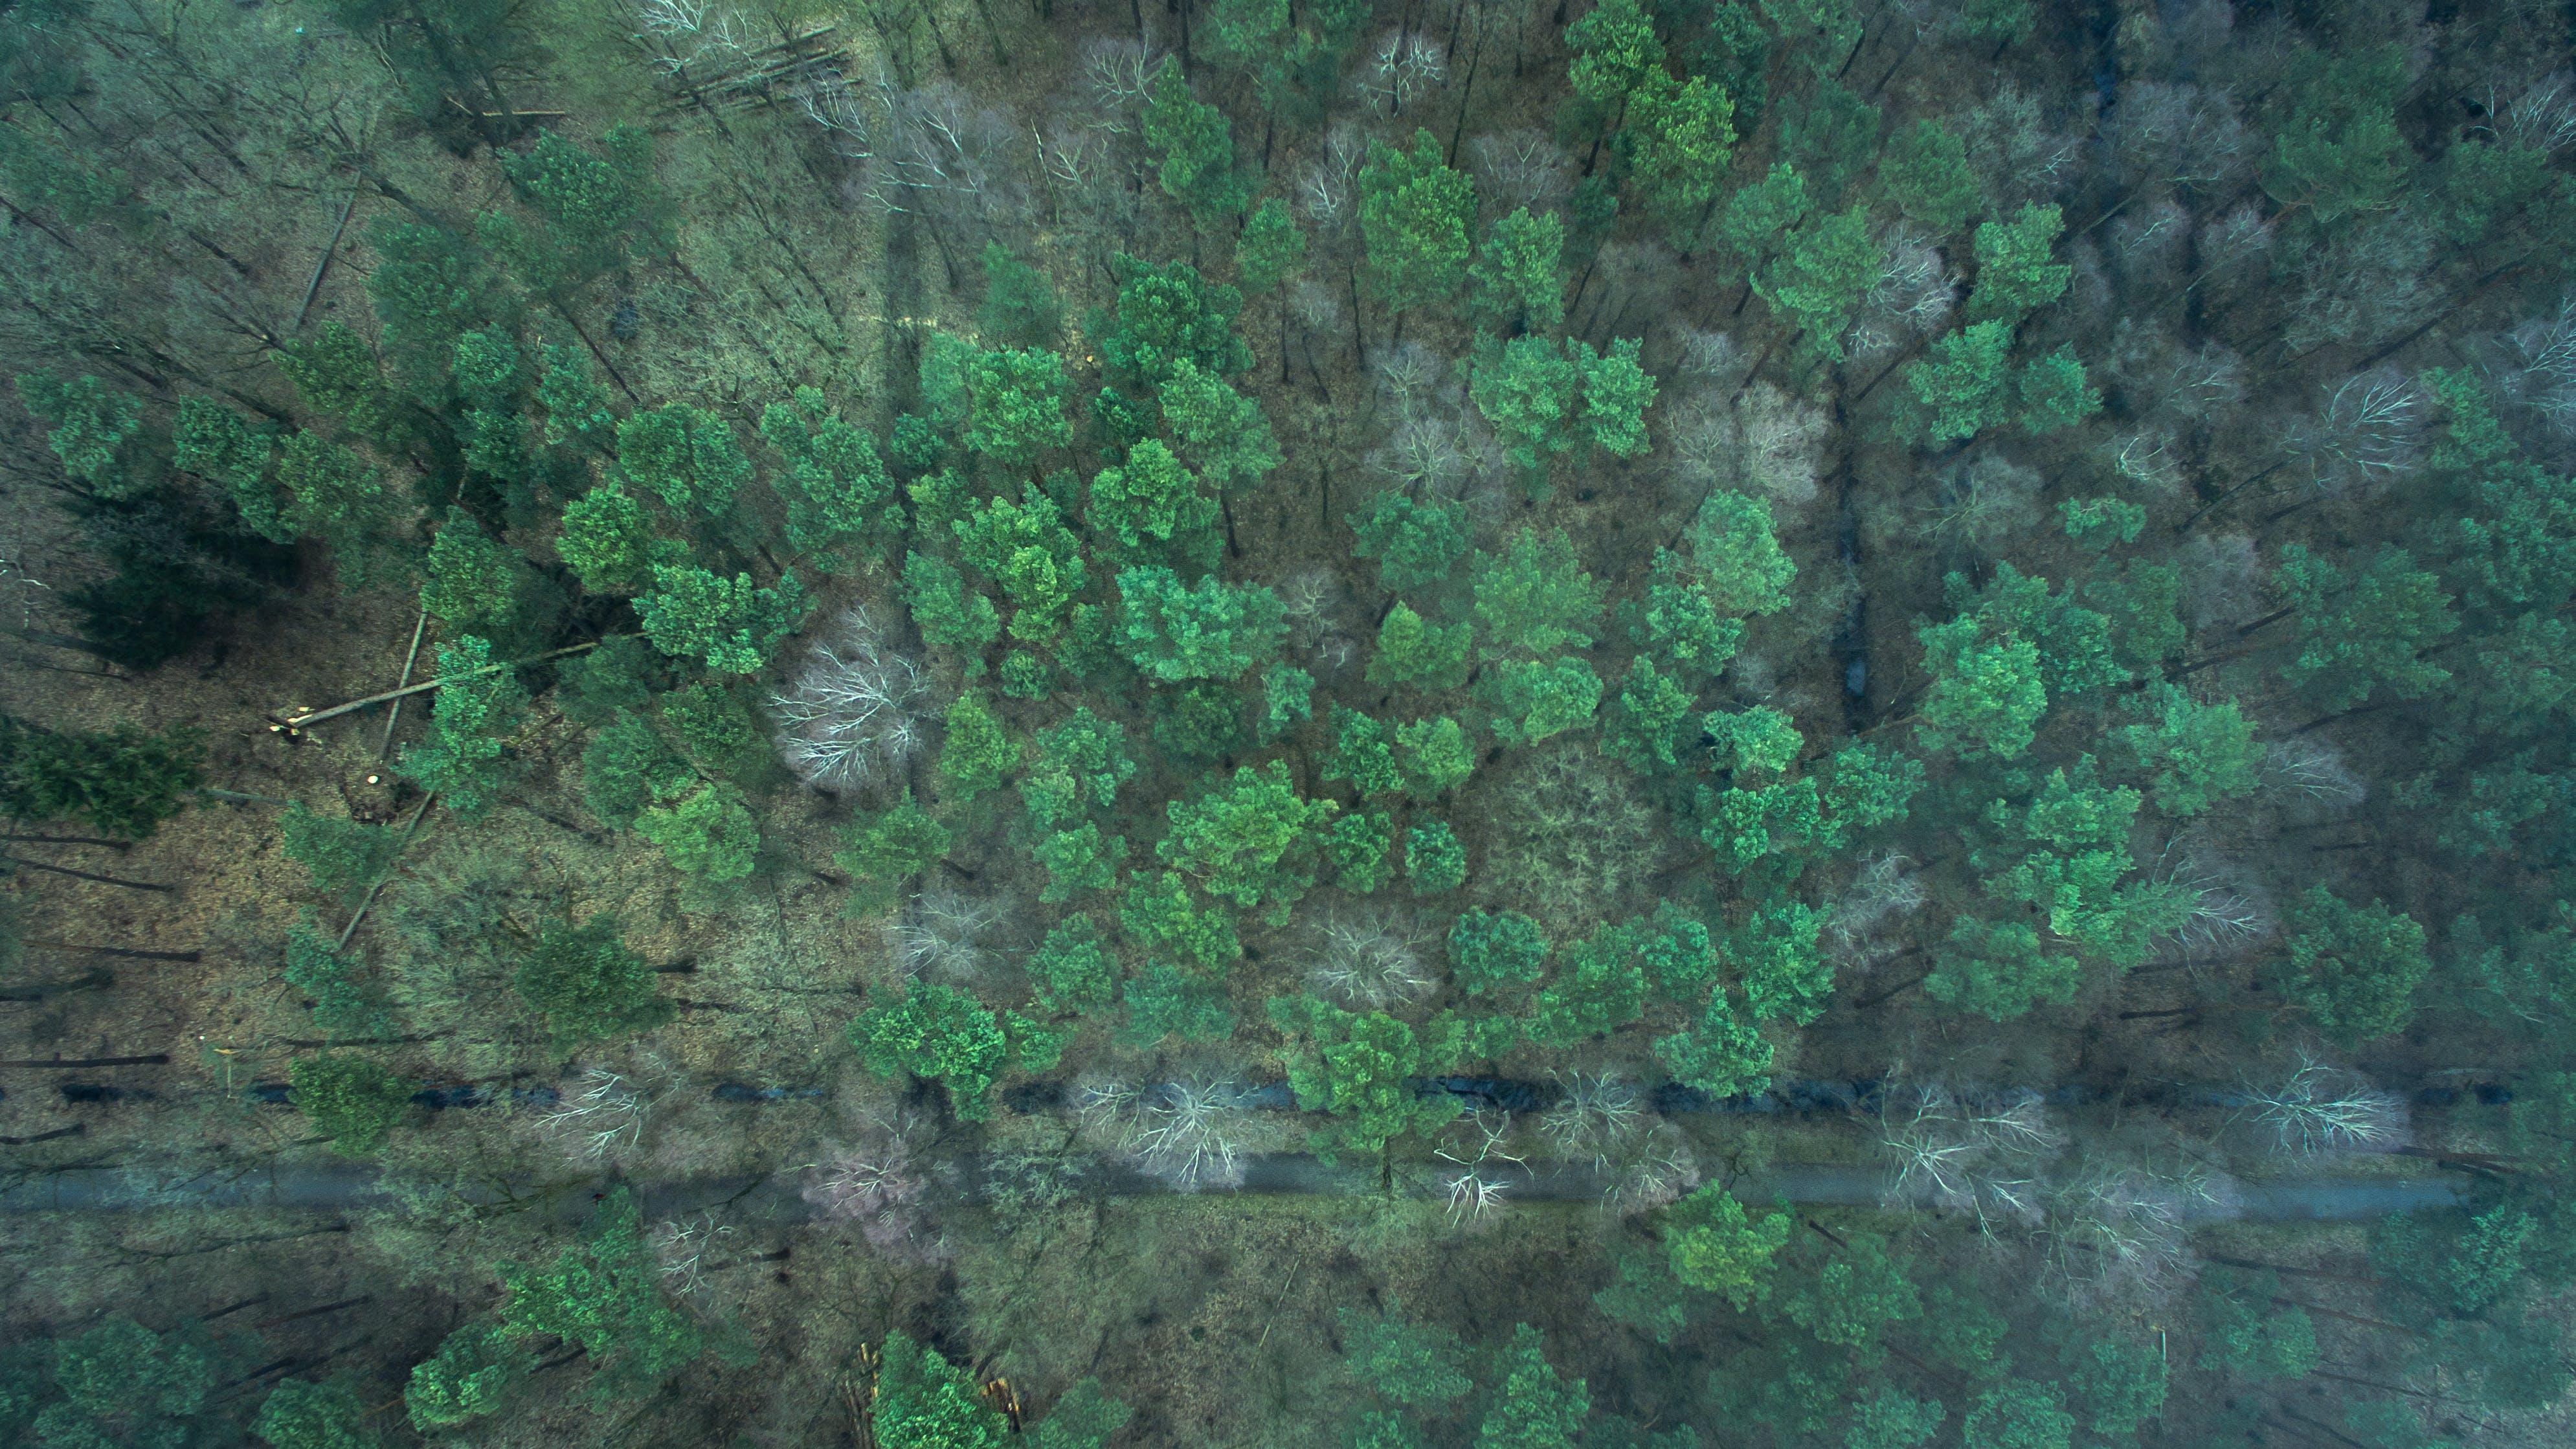 Fotobanka sbezplatnými fotkami na tému Čierny les, dron, HD tapeta, HDR